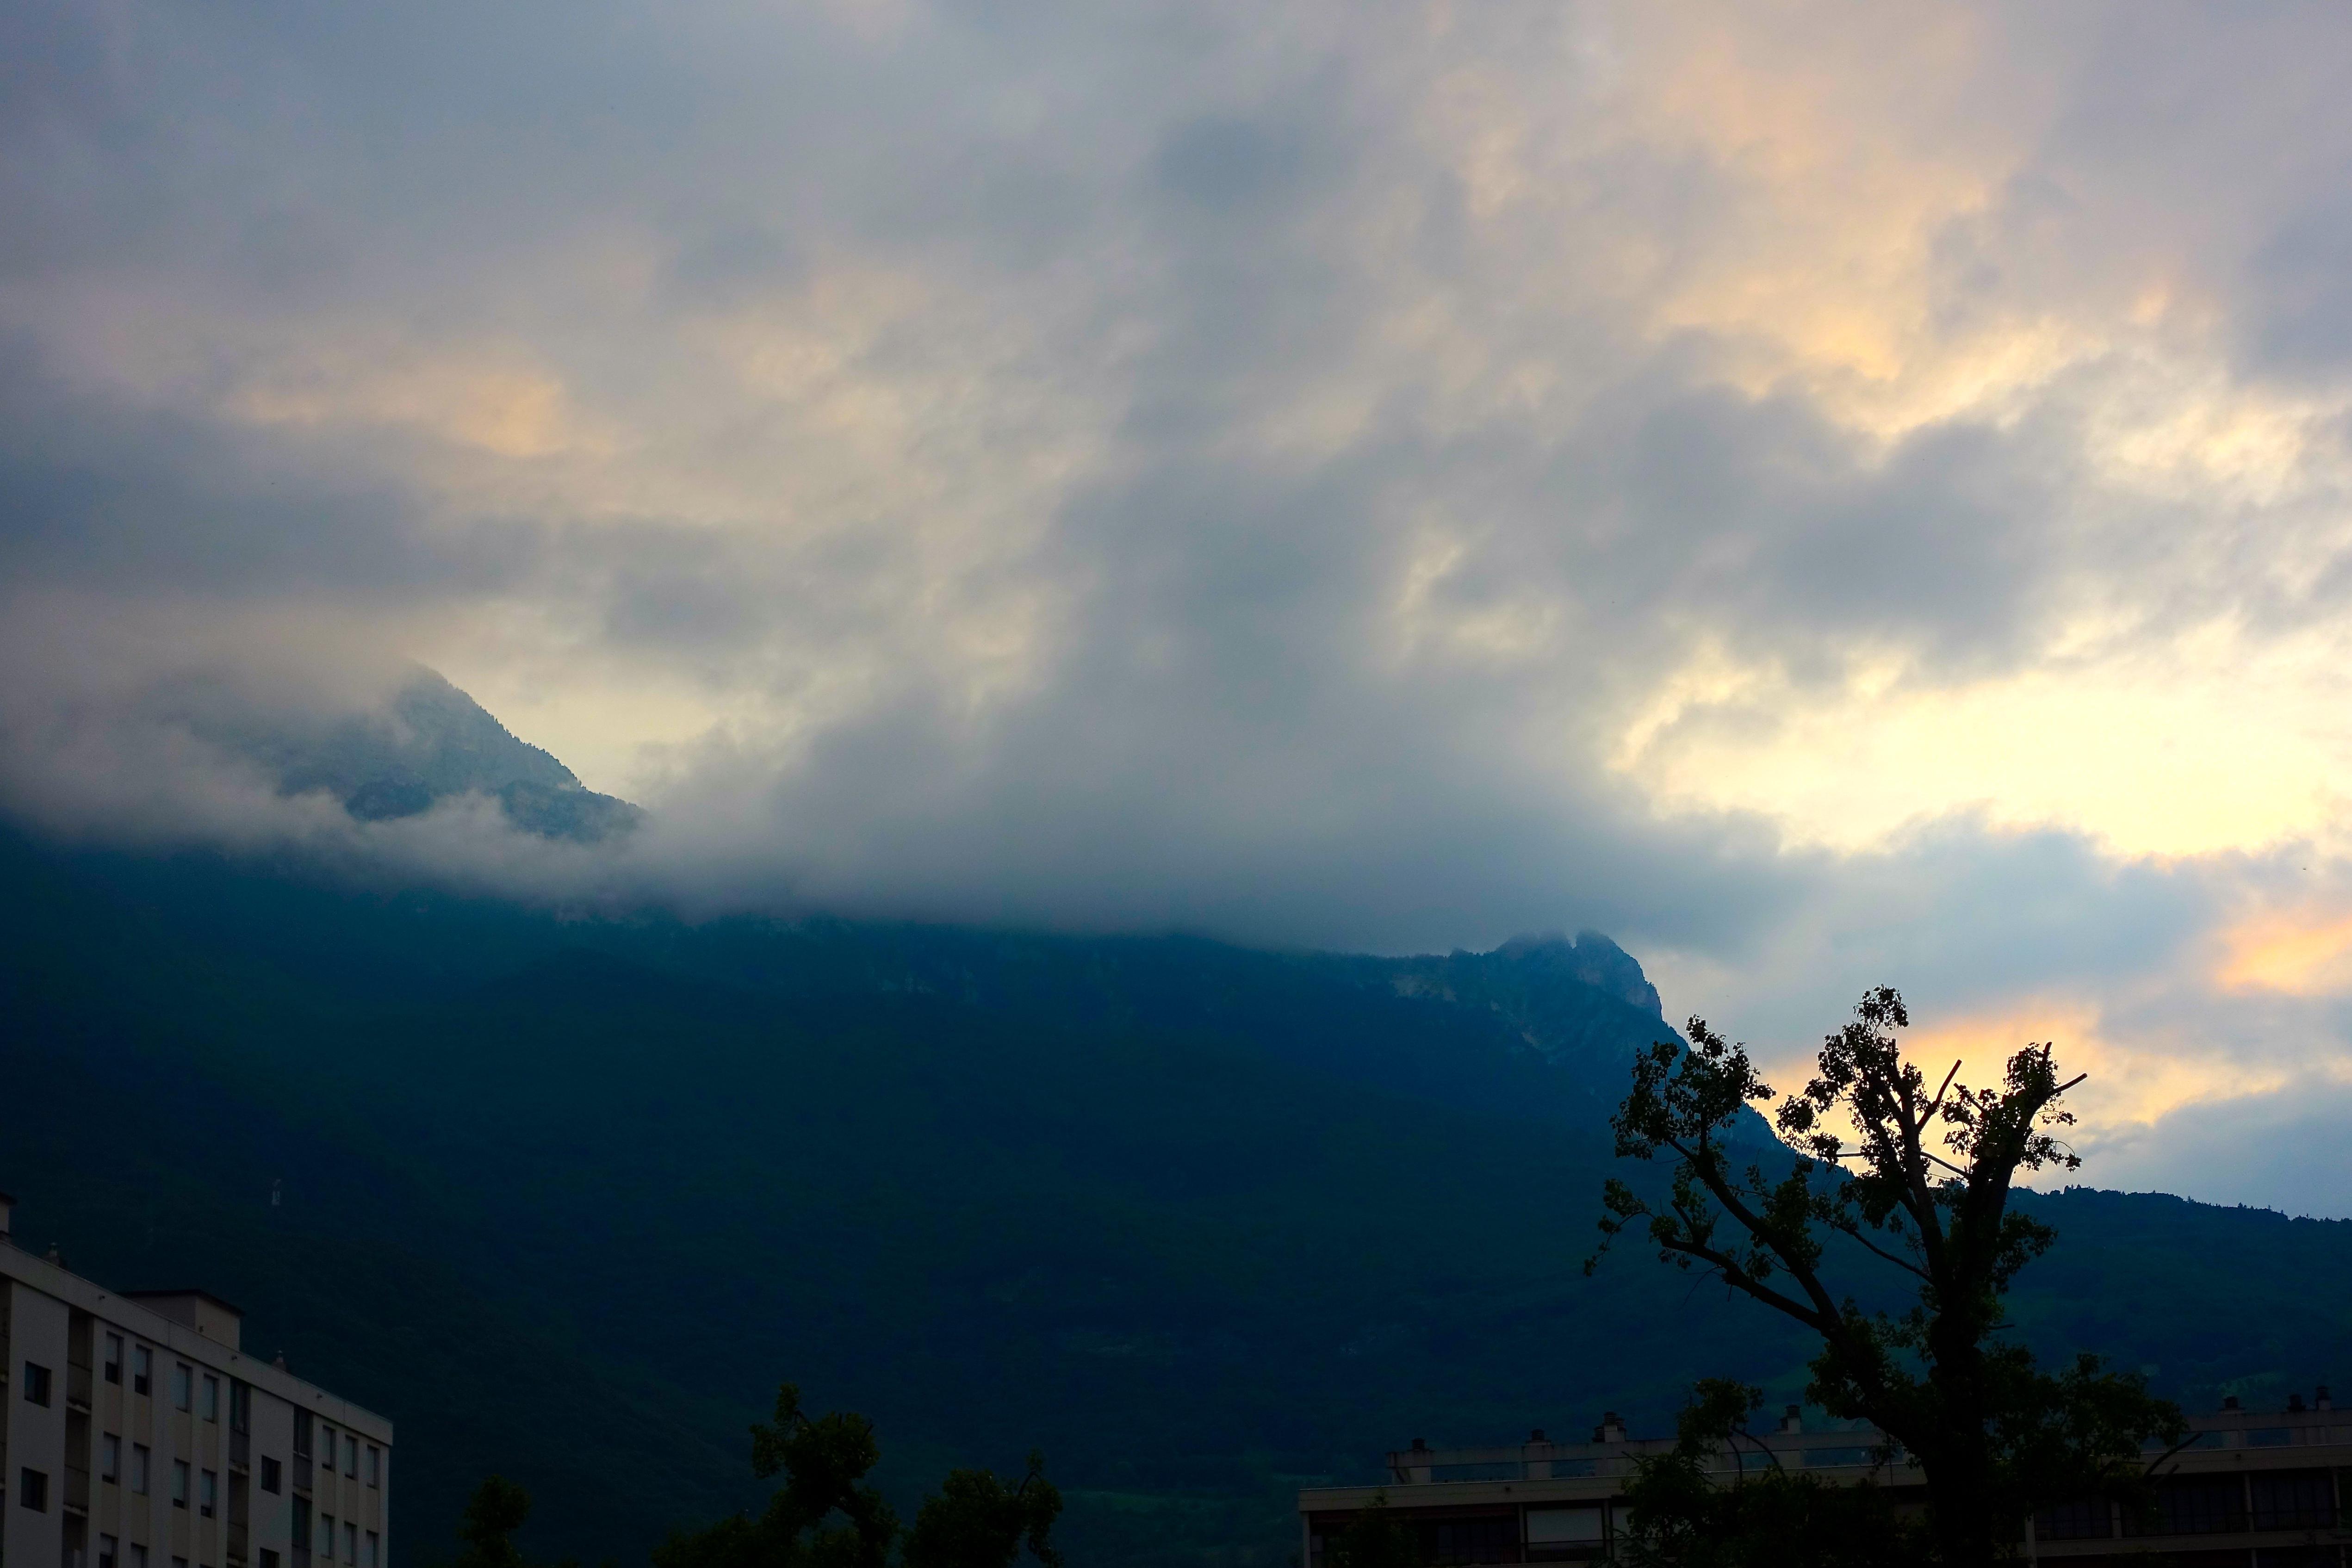 Sunrise over French Alps around Grenoble